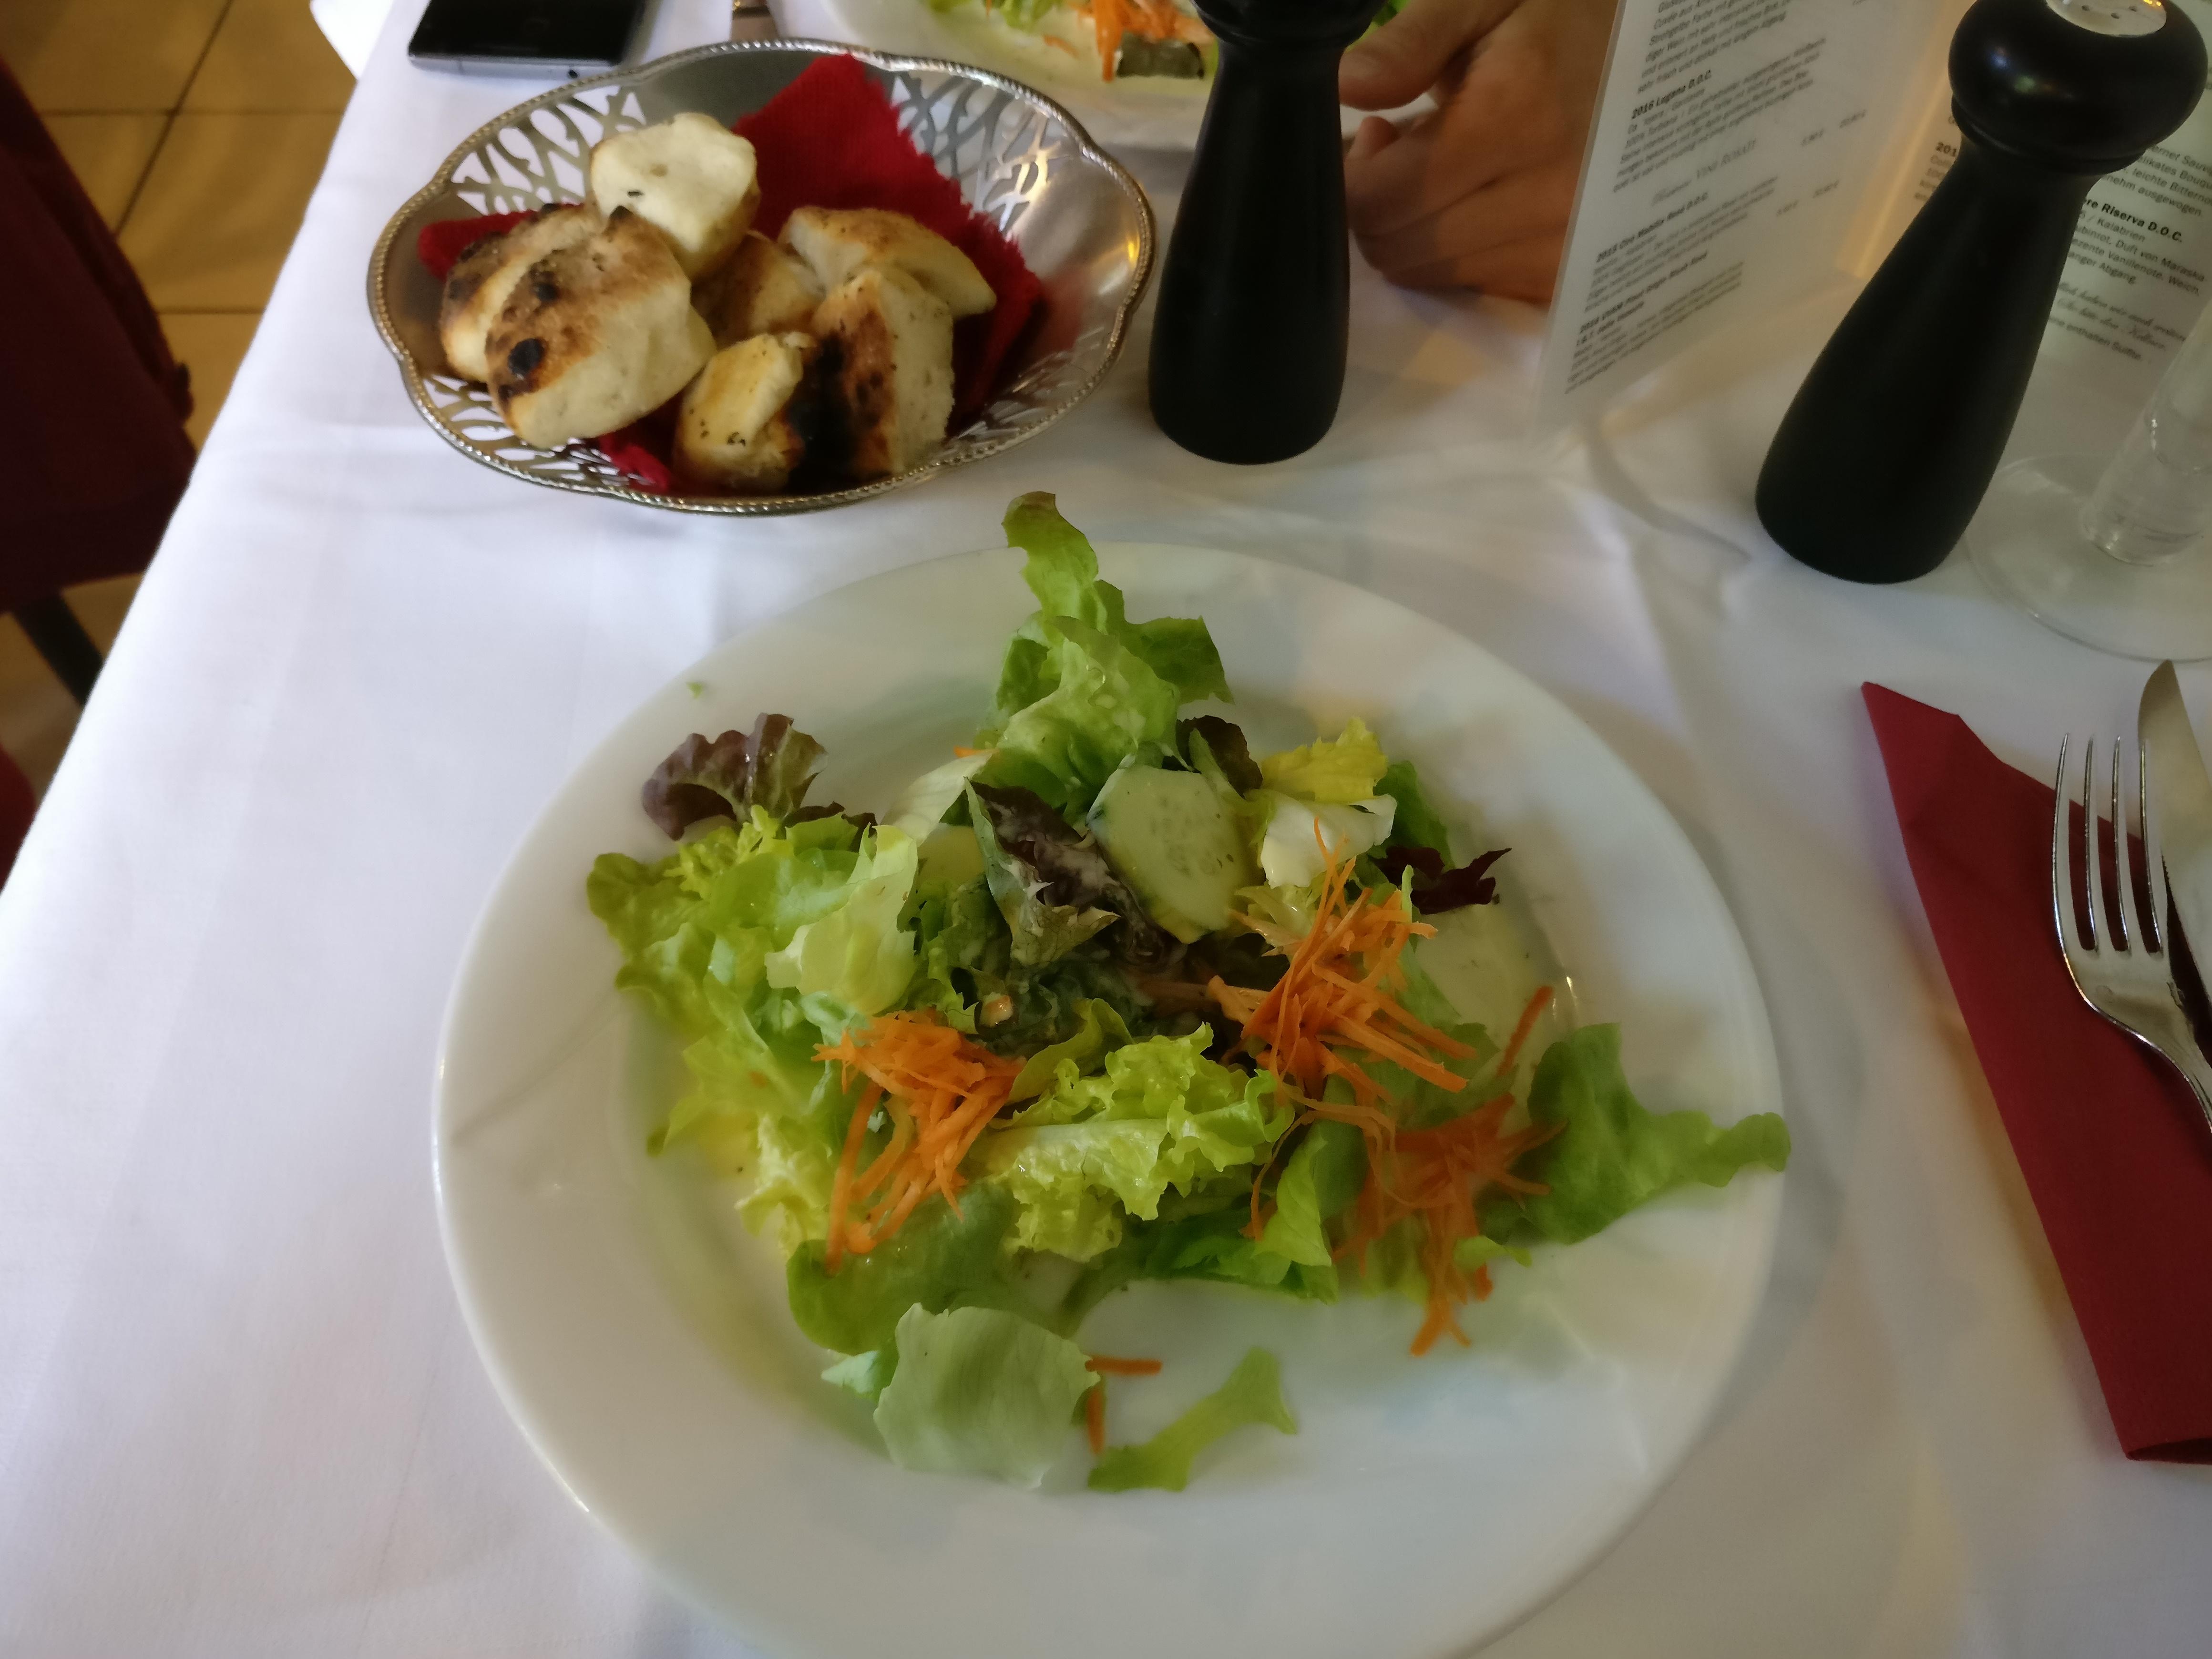 http://foodloader.net/nico_2017-05-11_salat-und-brot.jpg